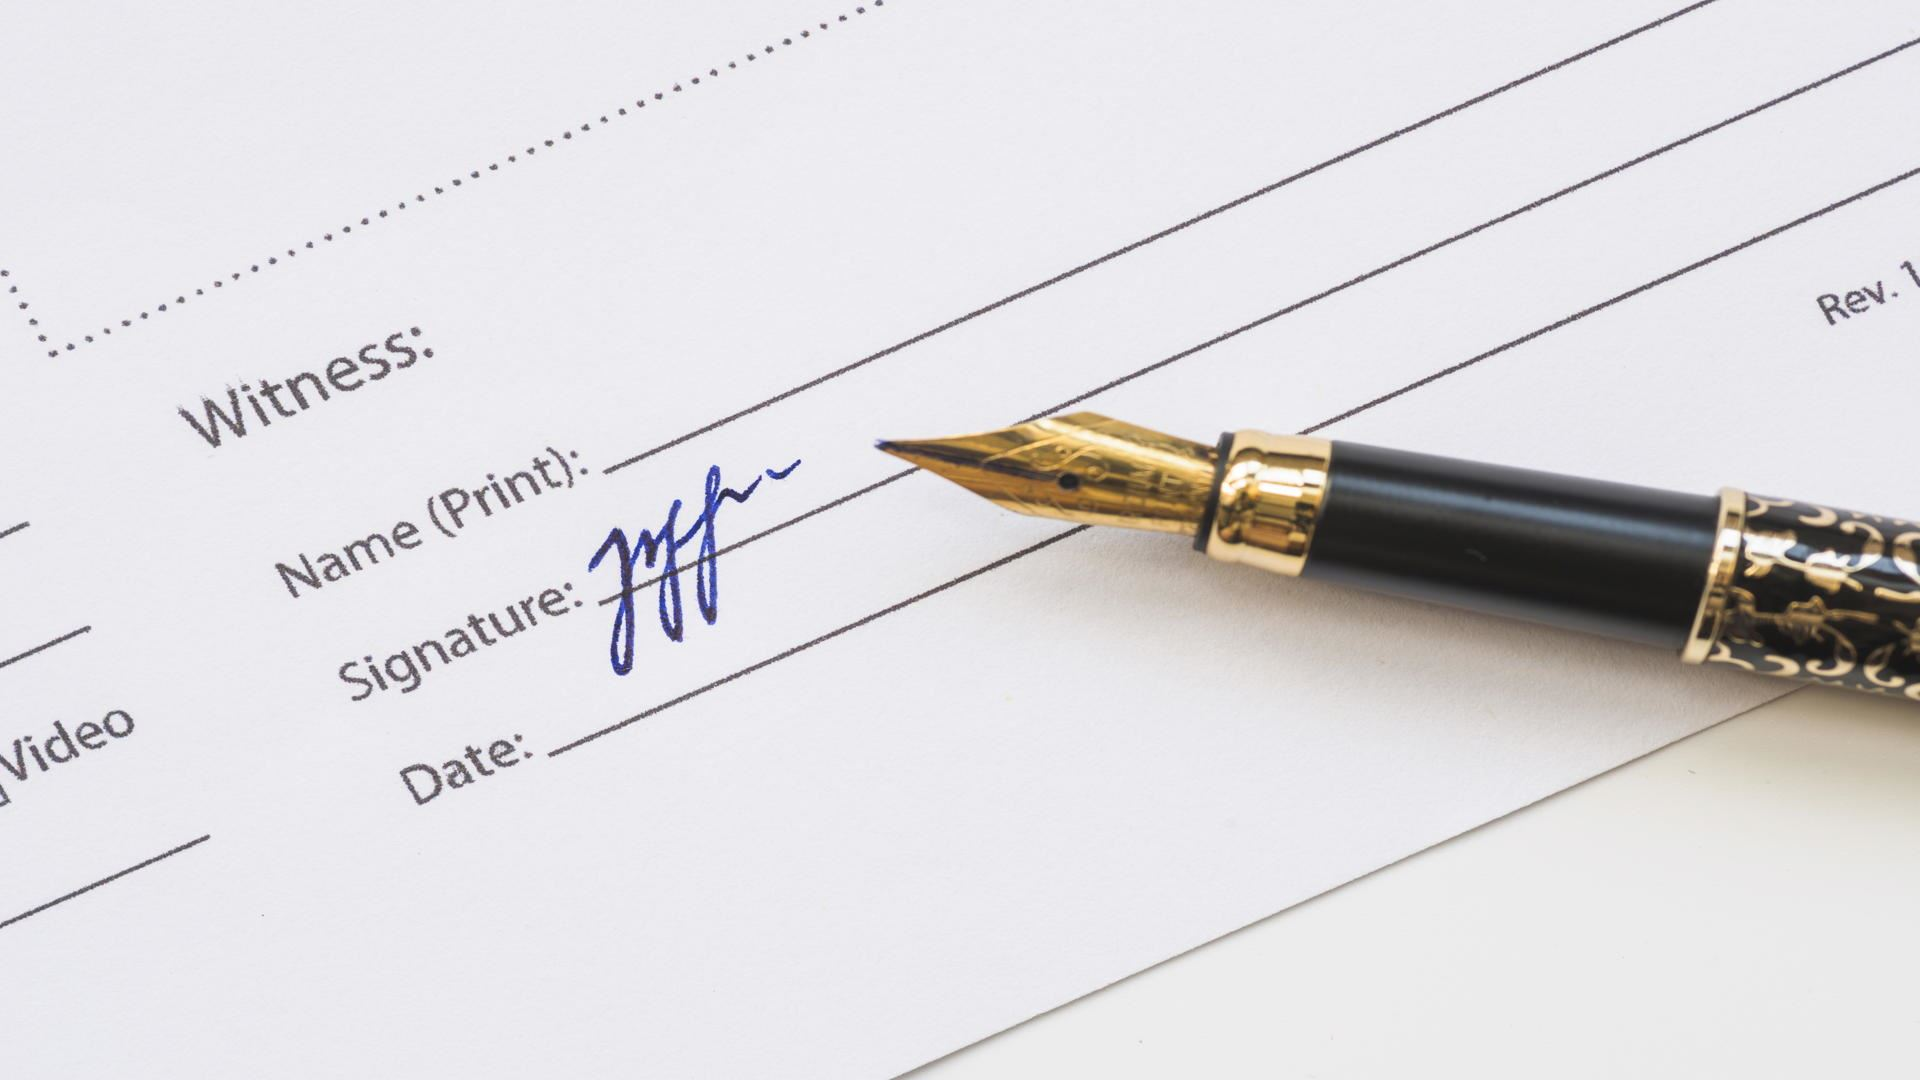 עריכת צוואה על ידי עורך דין